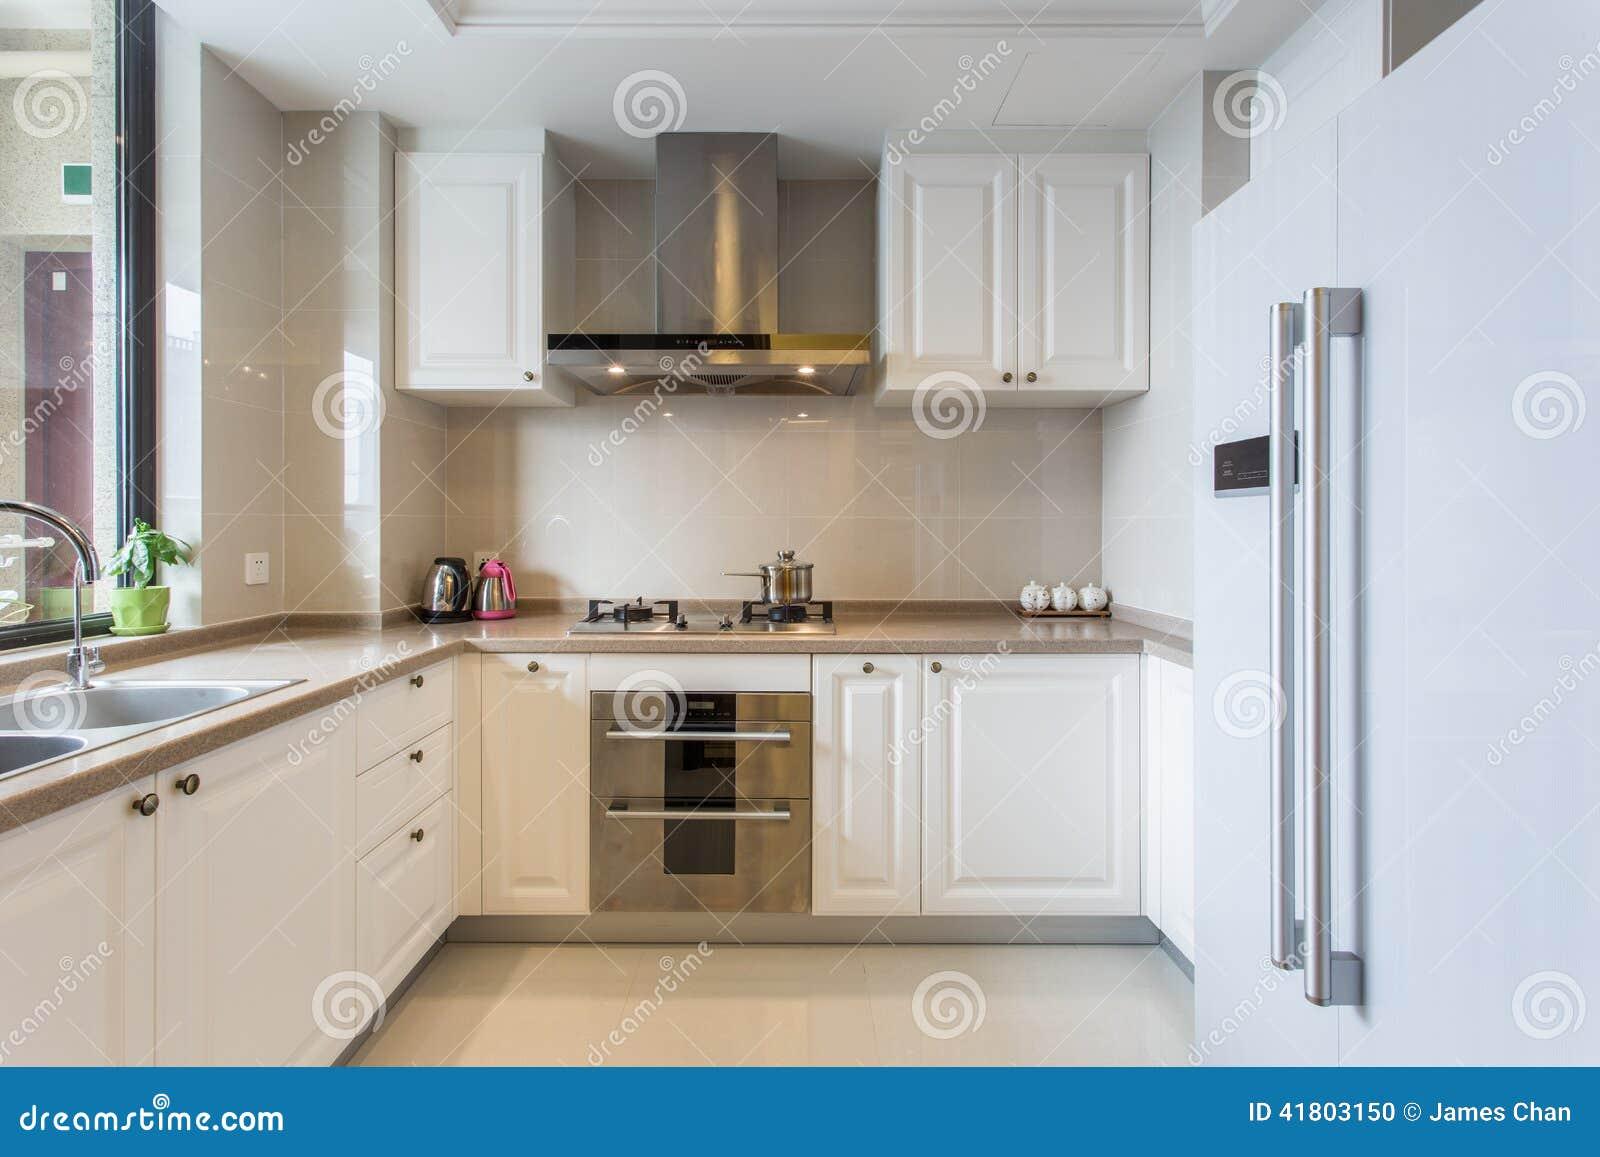 Grote Moderne Keuken : Stock Foto: Moderne witte grote keuken